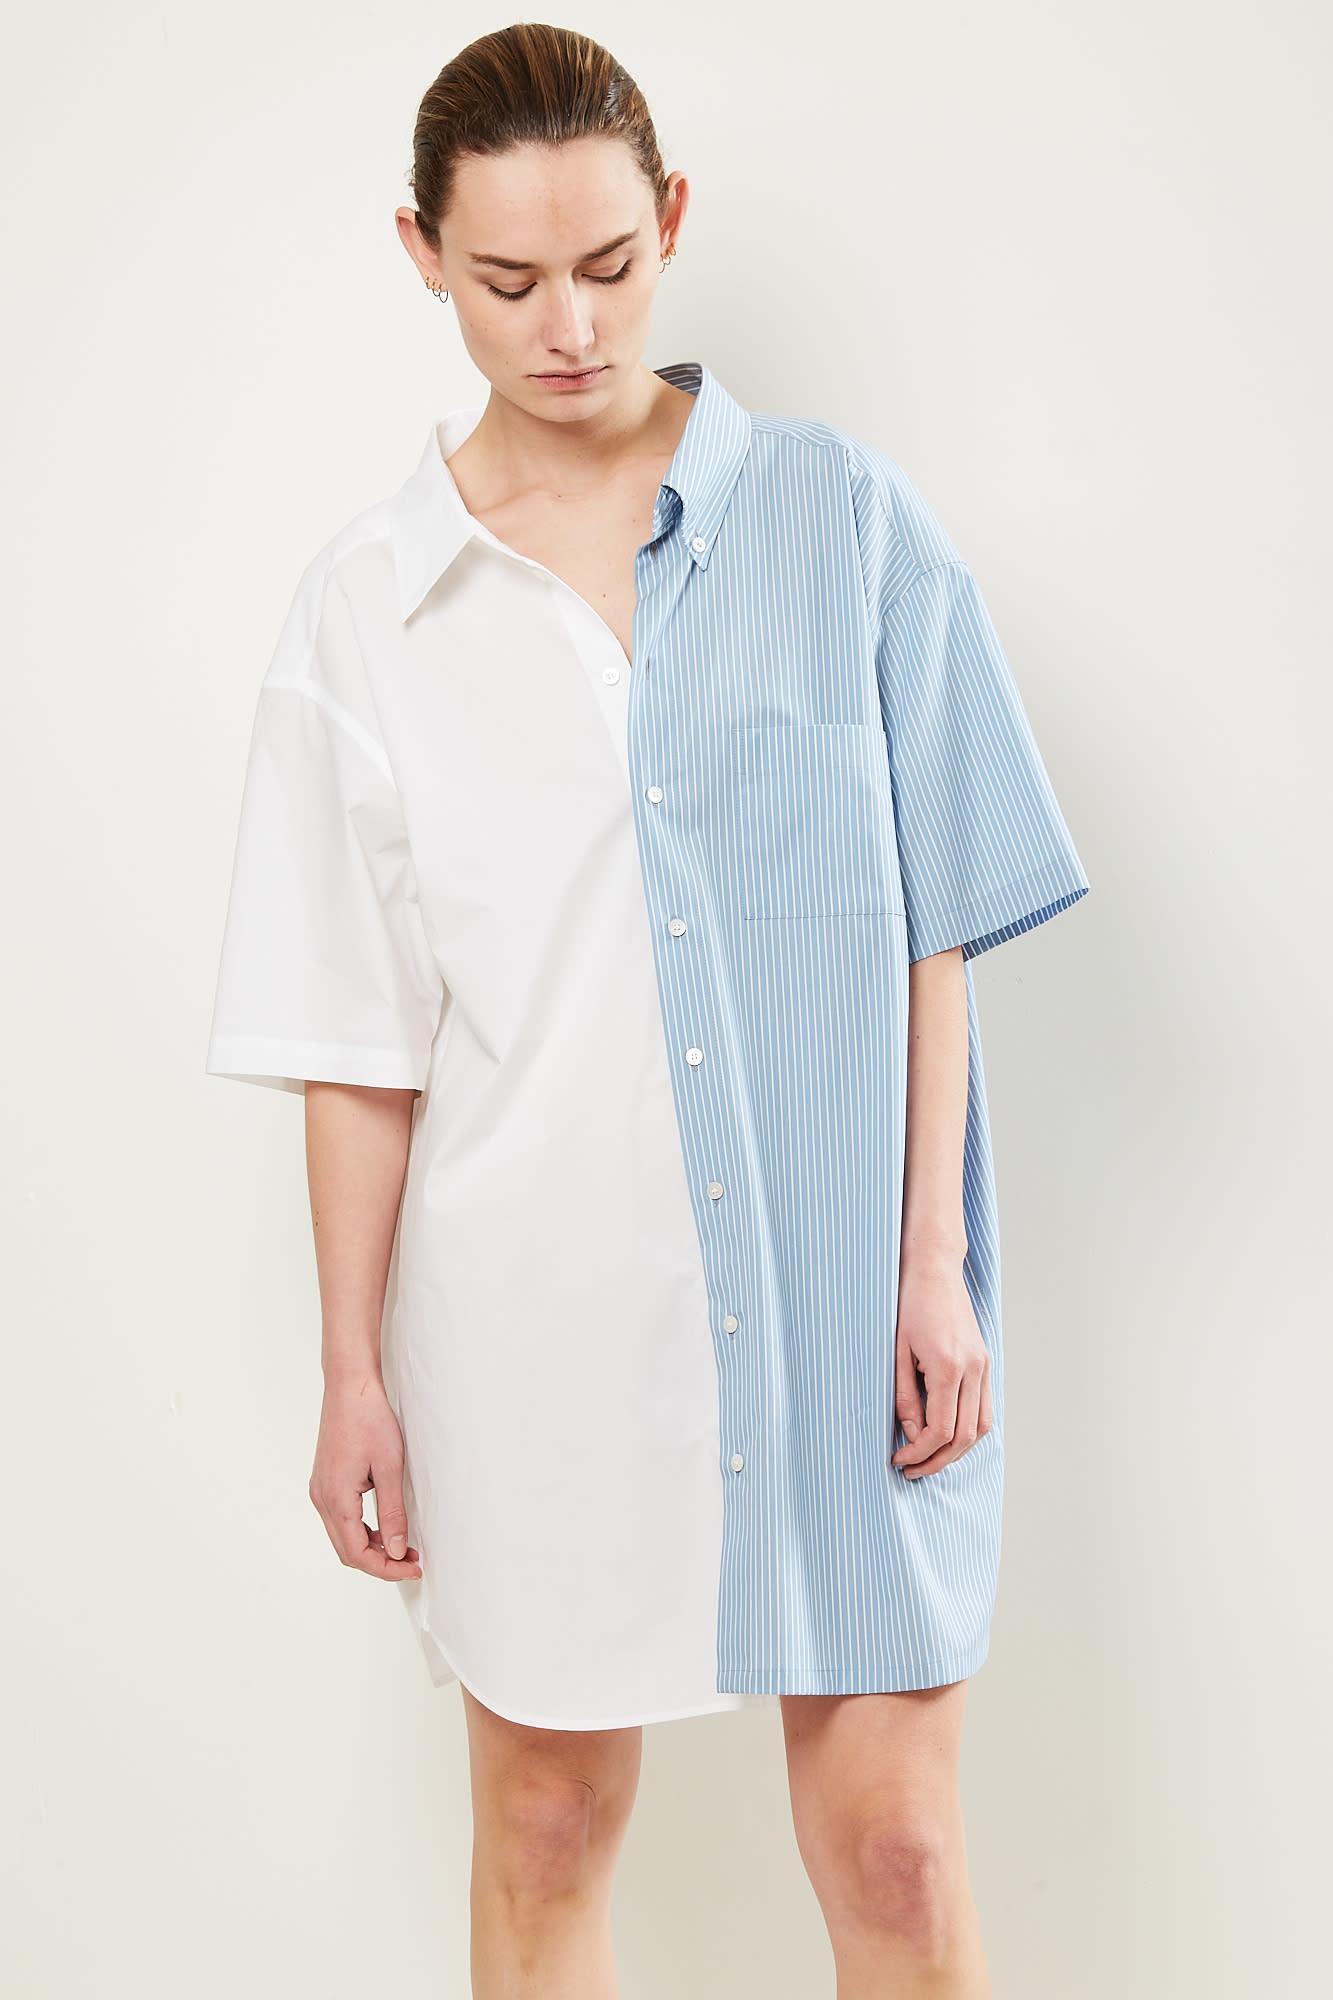 MM6 Shirt 961 white grey blue stripes